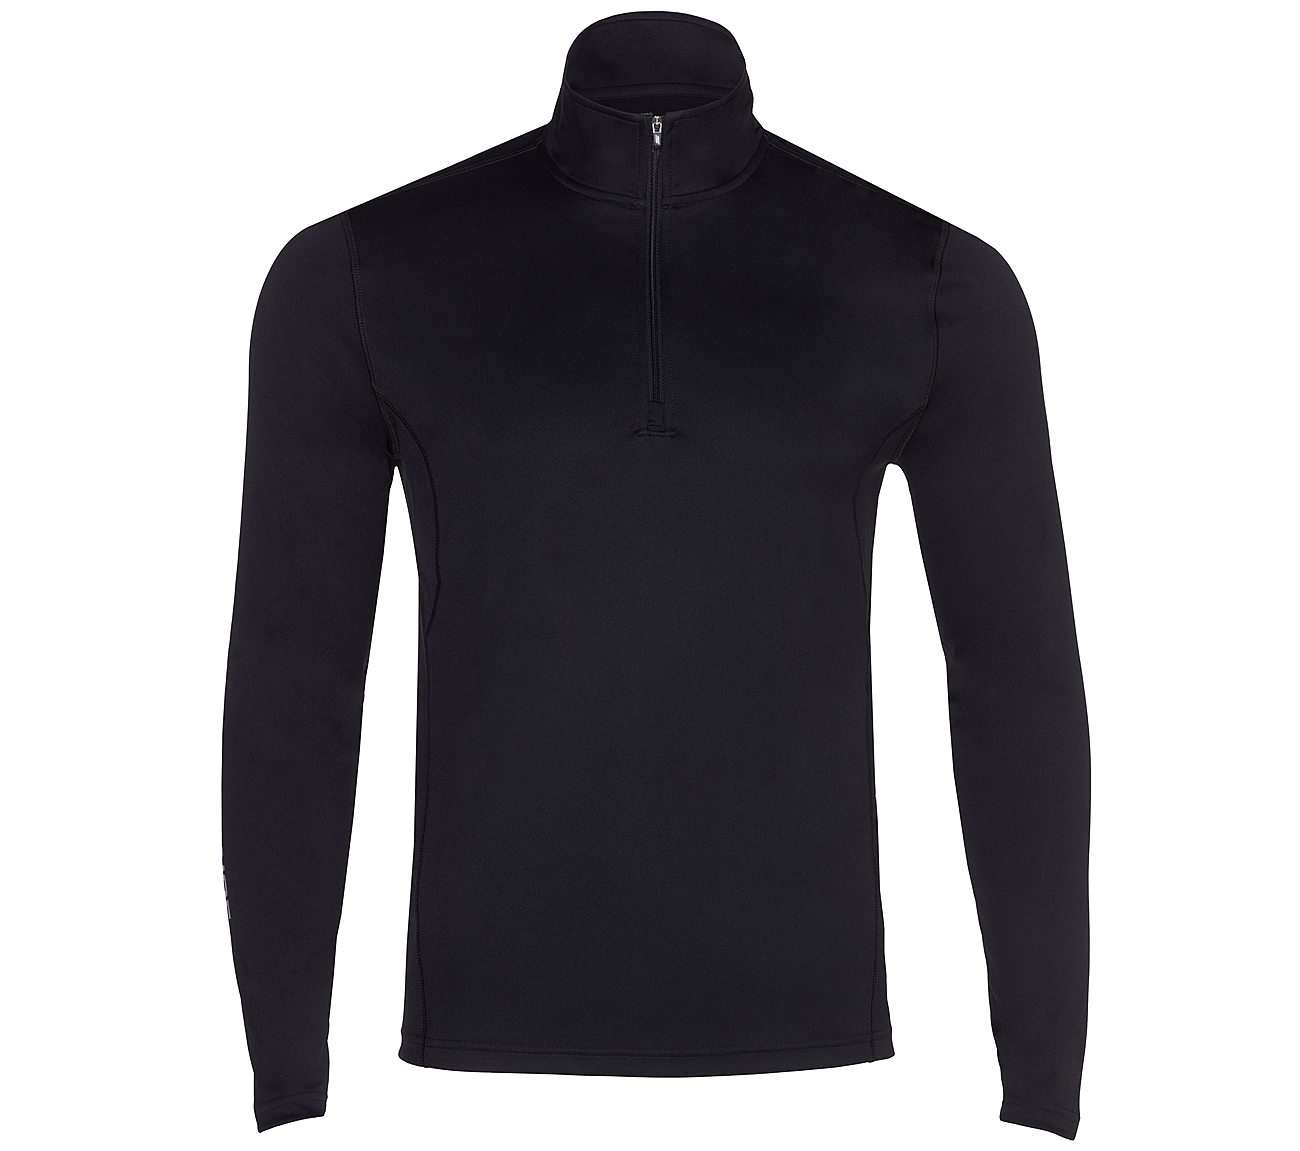 Skechers GO Dri Ultra LS 1/4 Zip Shirt